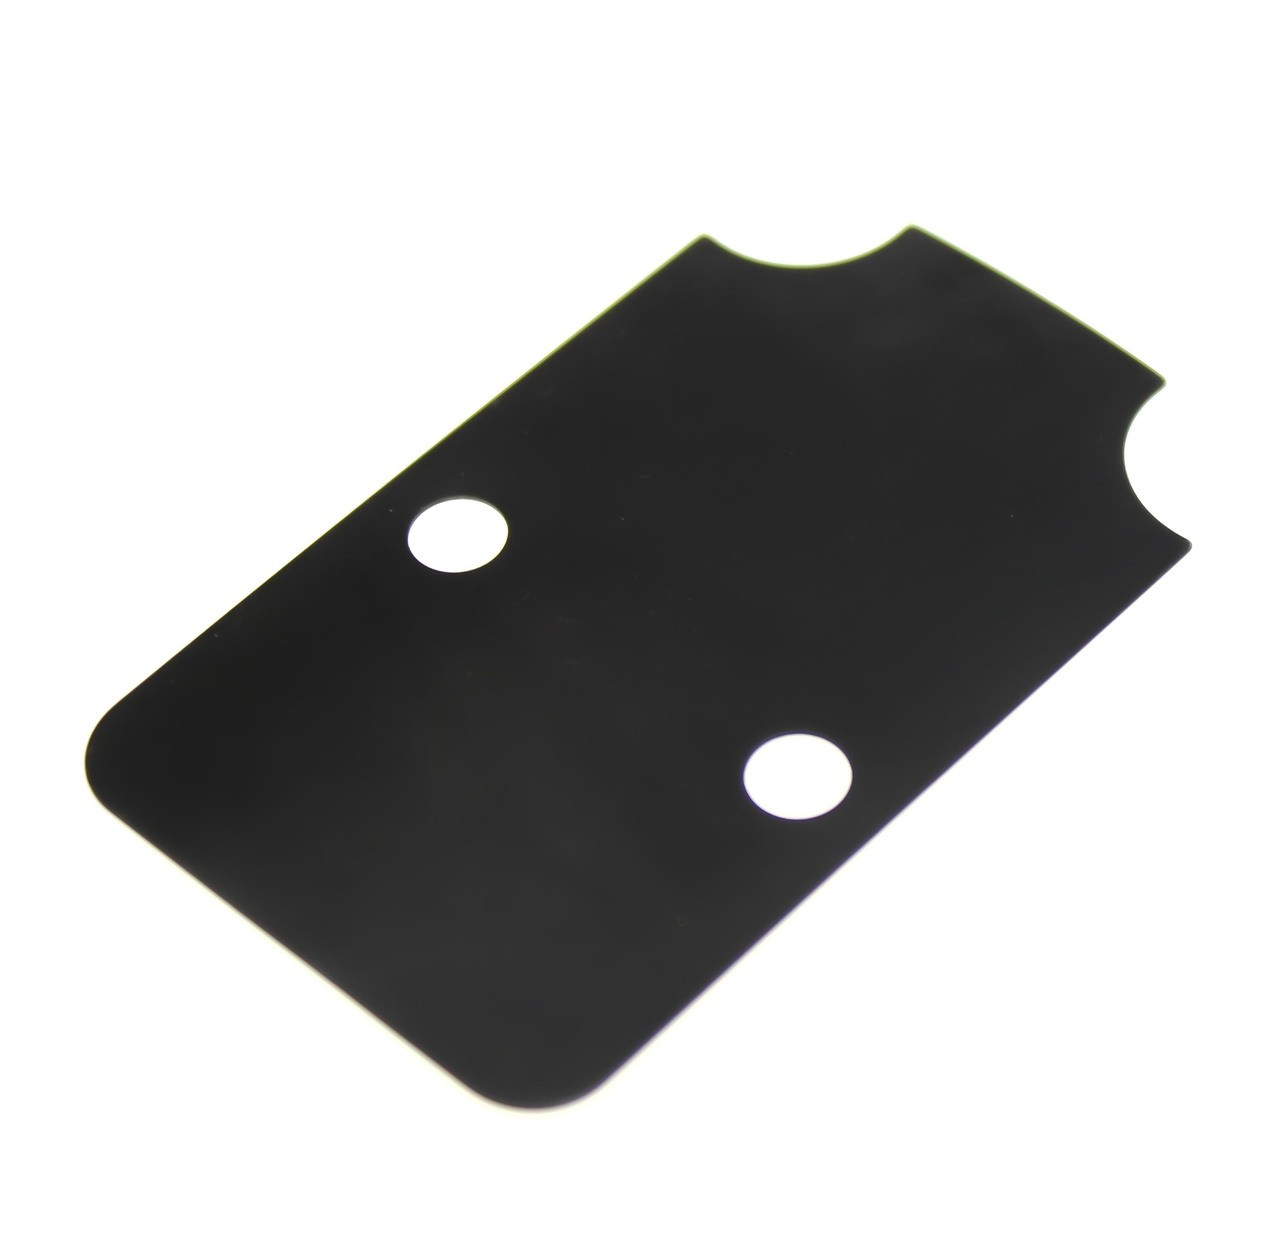 Standard Sealing Plate for Trijicon RMR: Type 2 & Dual Illuminated Models Black